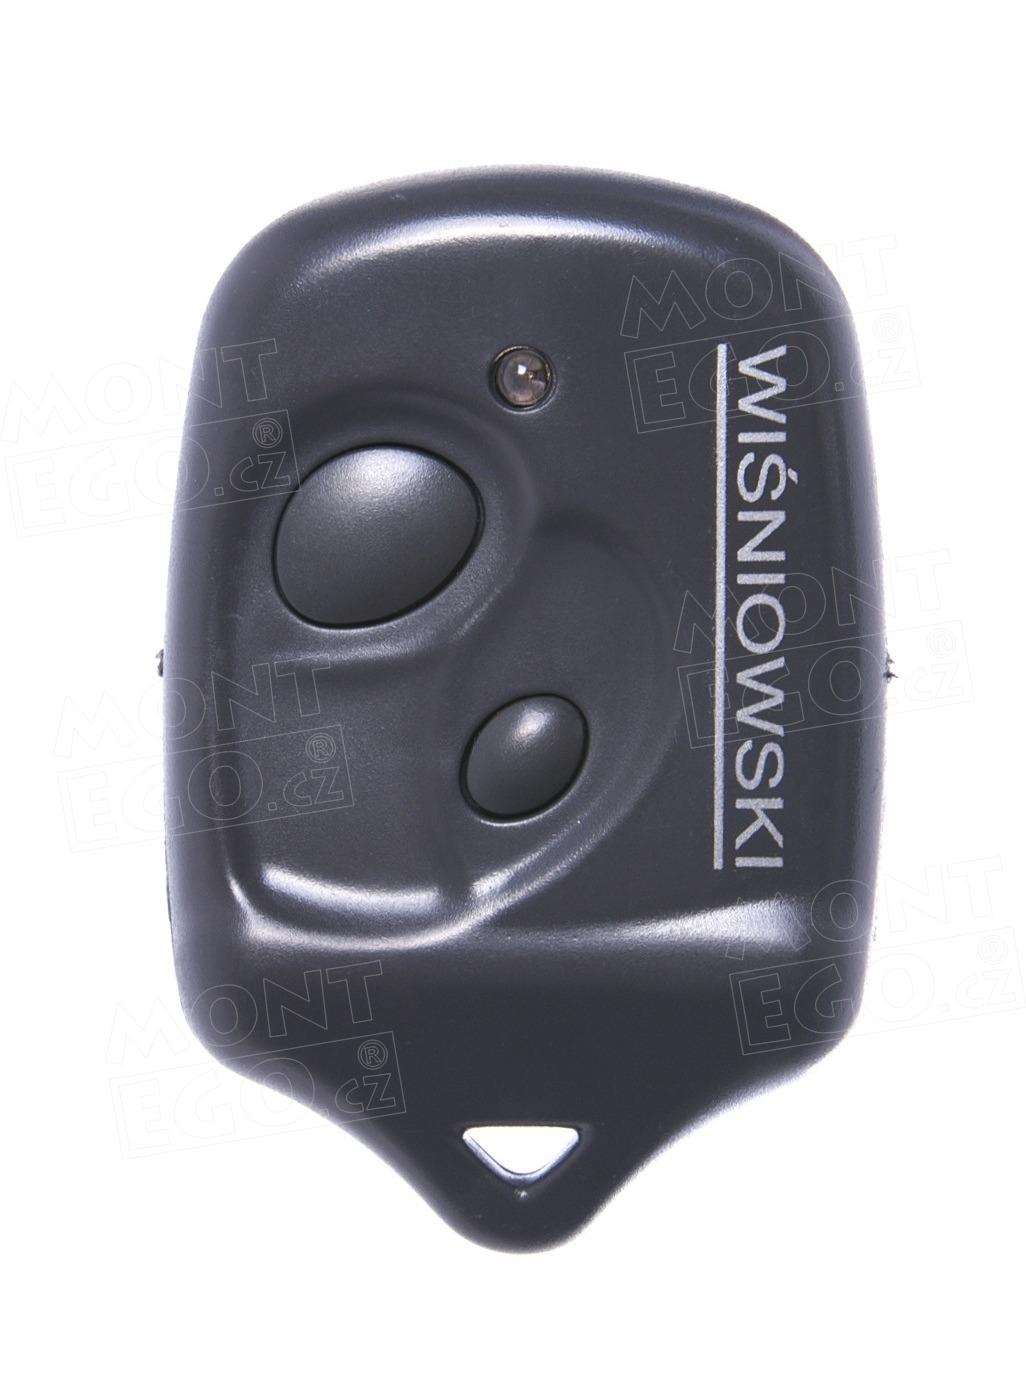 Dálkový ovladač 2K433 pro pohony Wisniowski na garážová vrata a brány